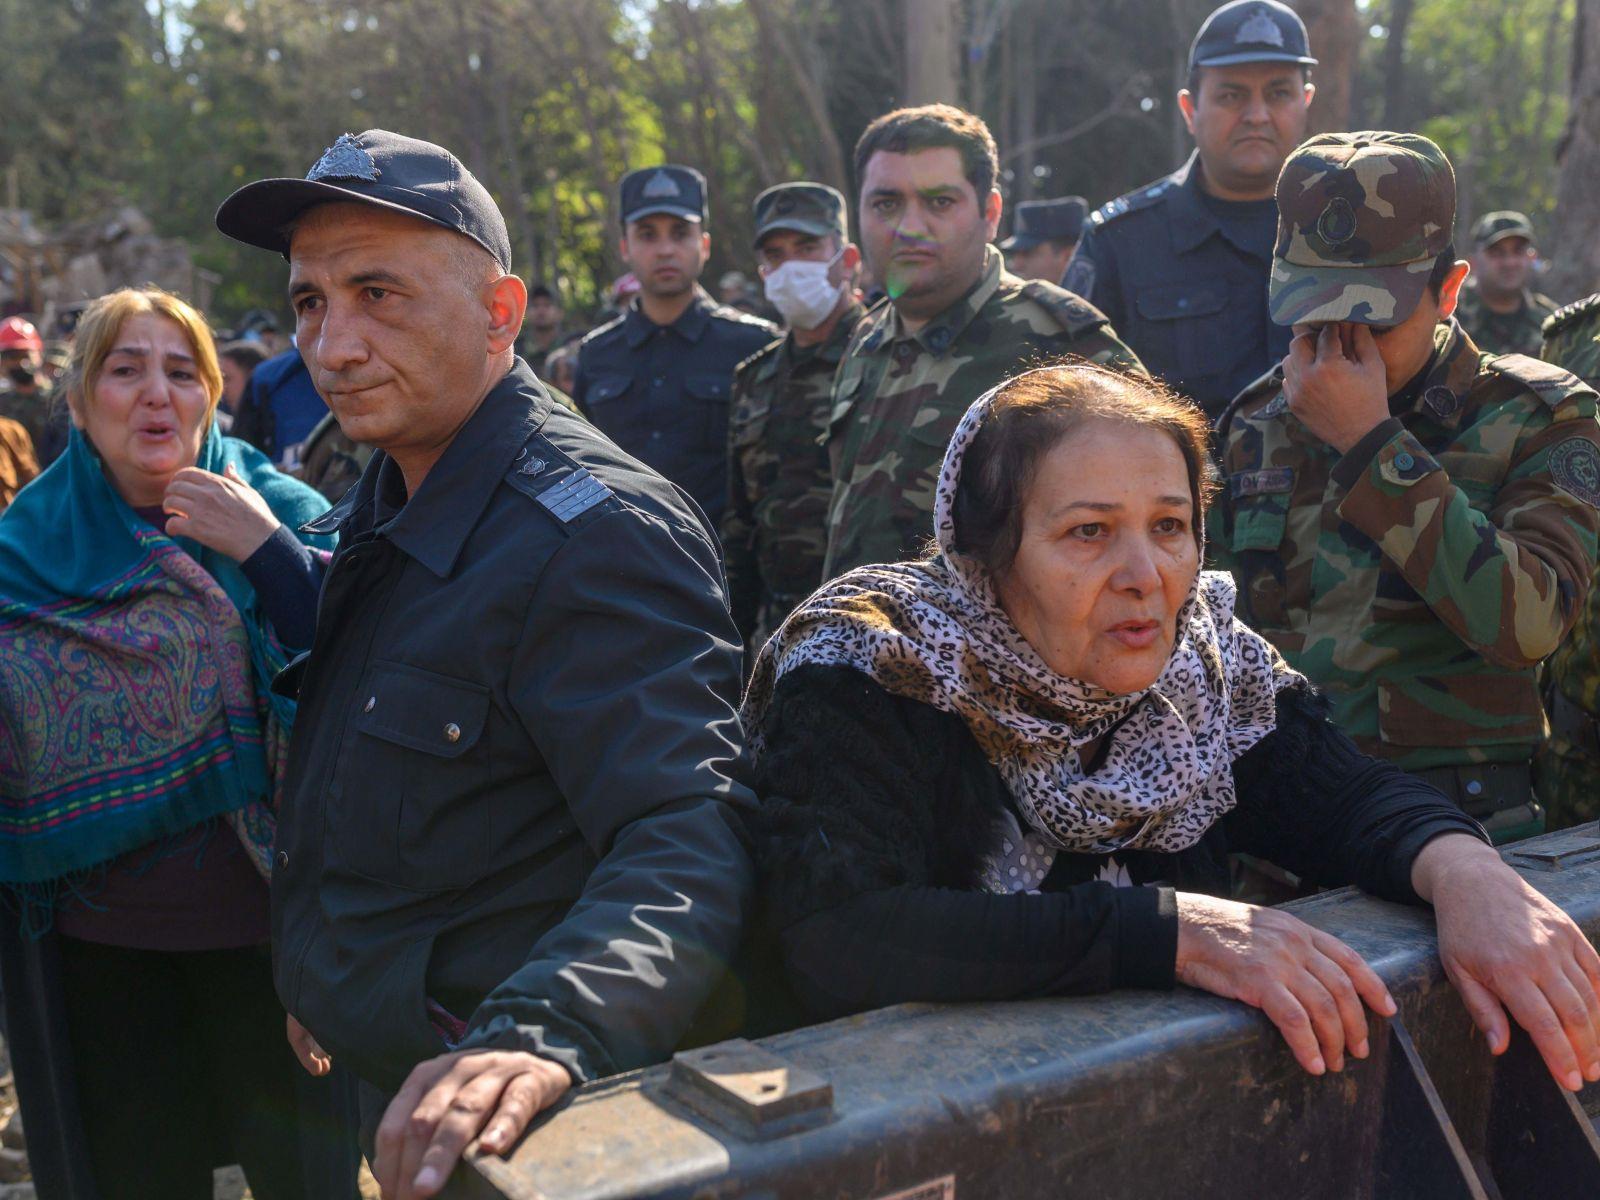 AFP/Bulent Kilic